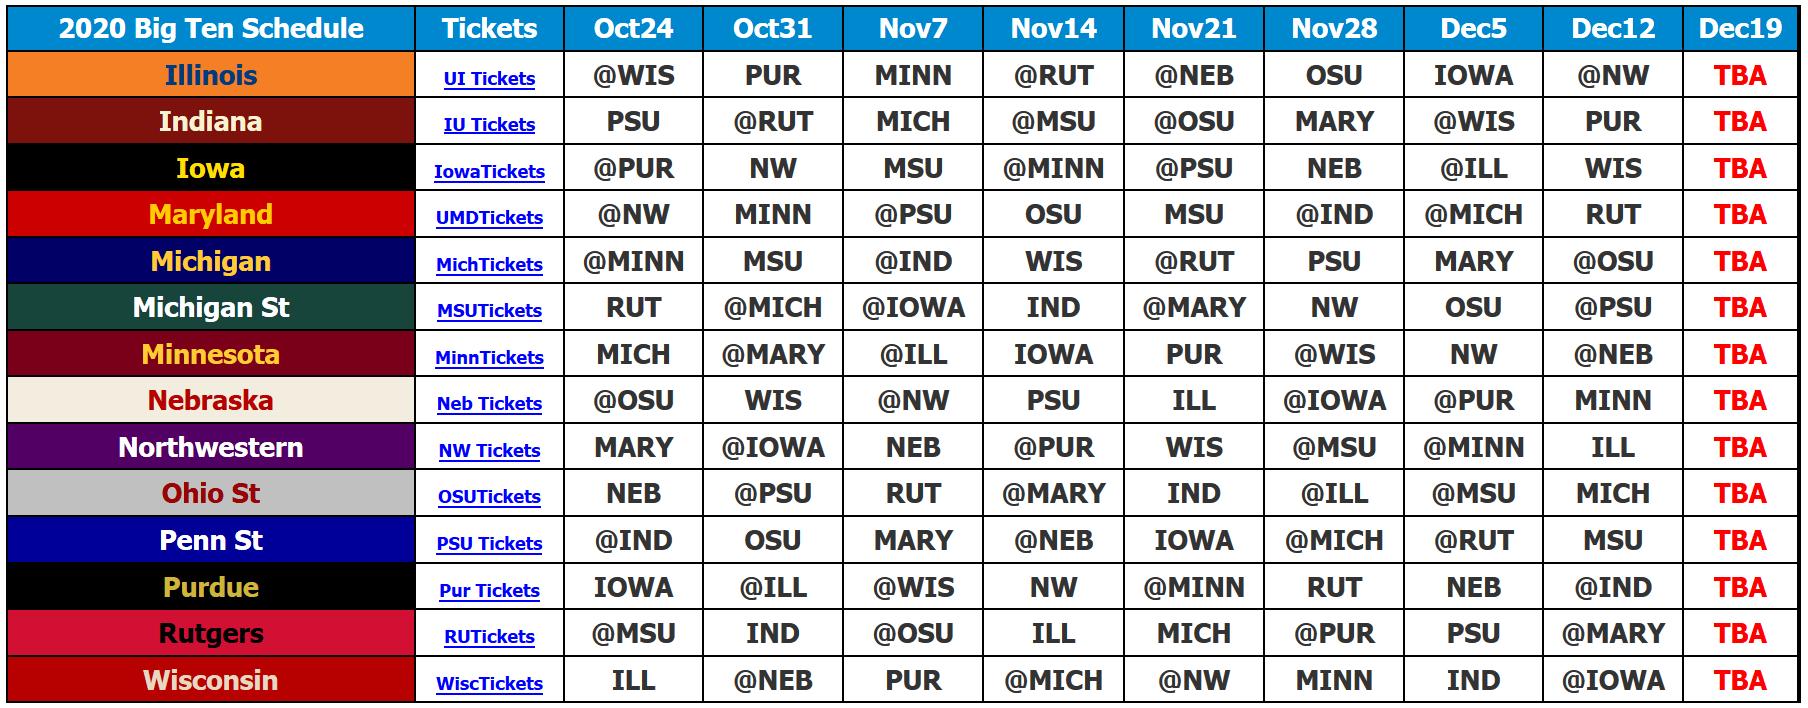 2020 Big Ten Football Schedule Grid Covid-19